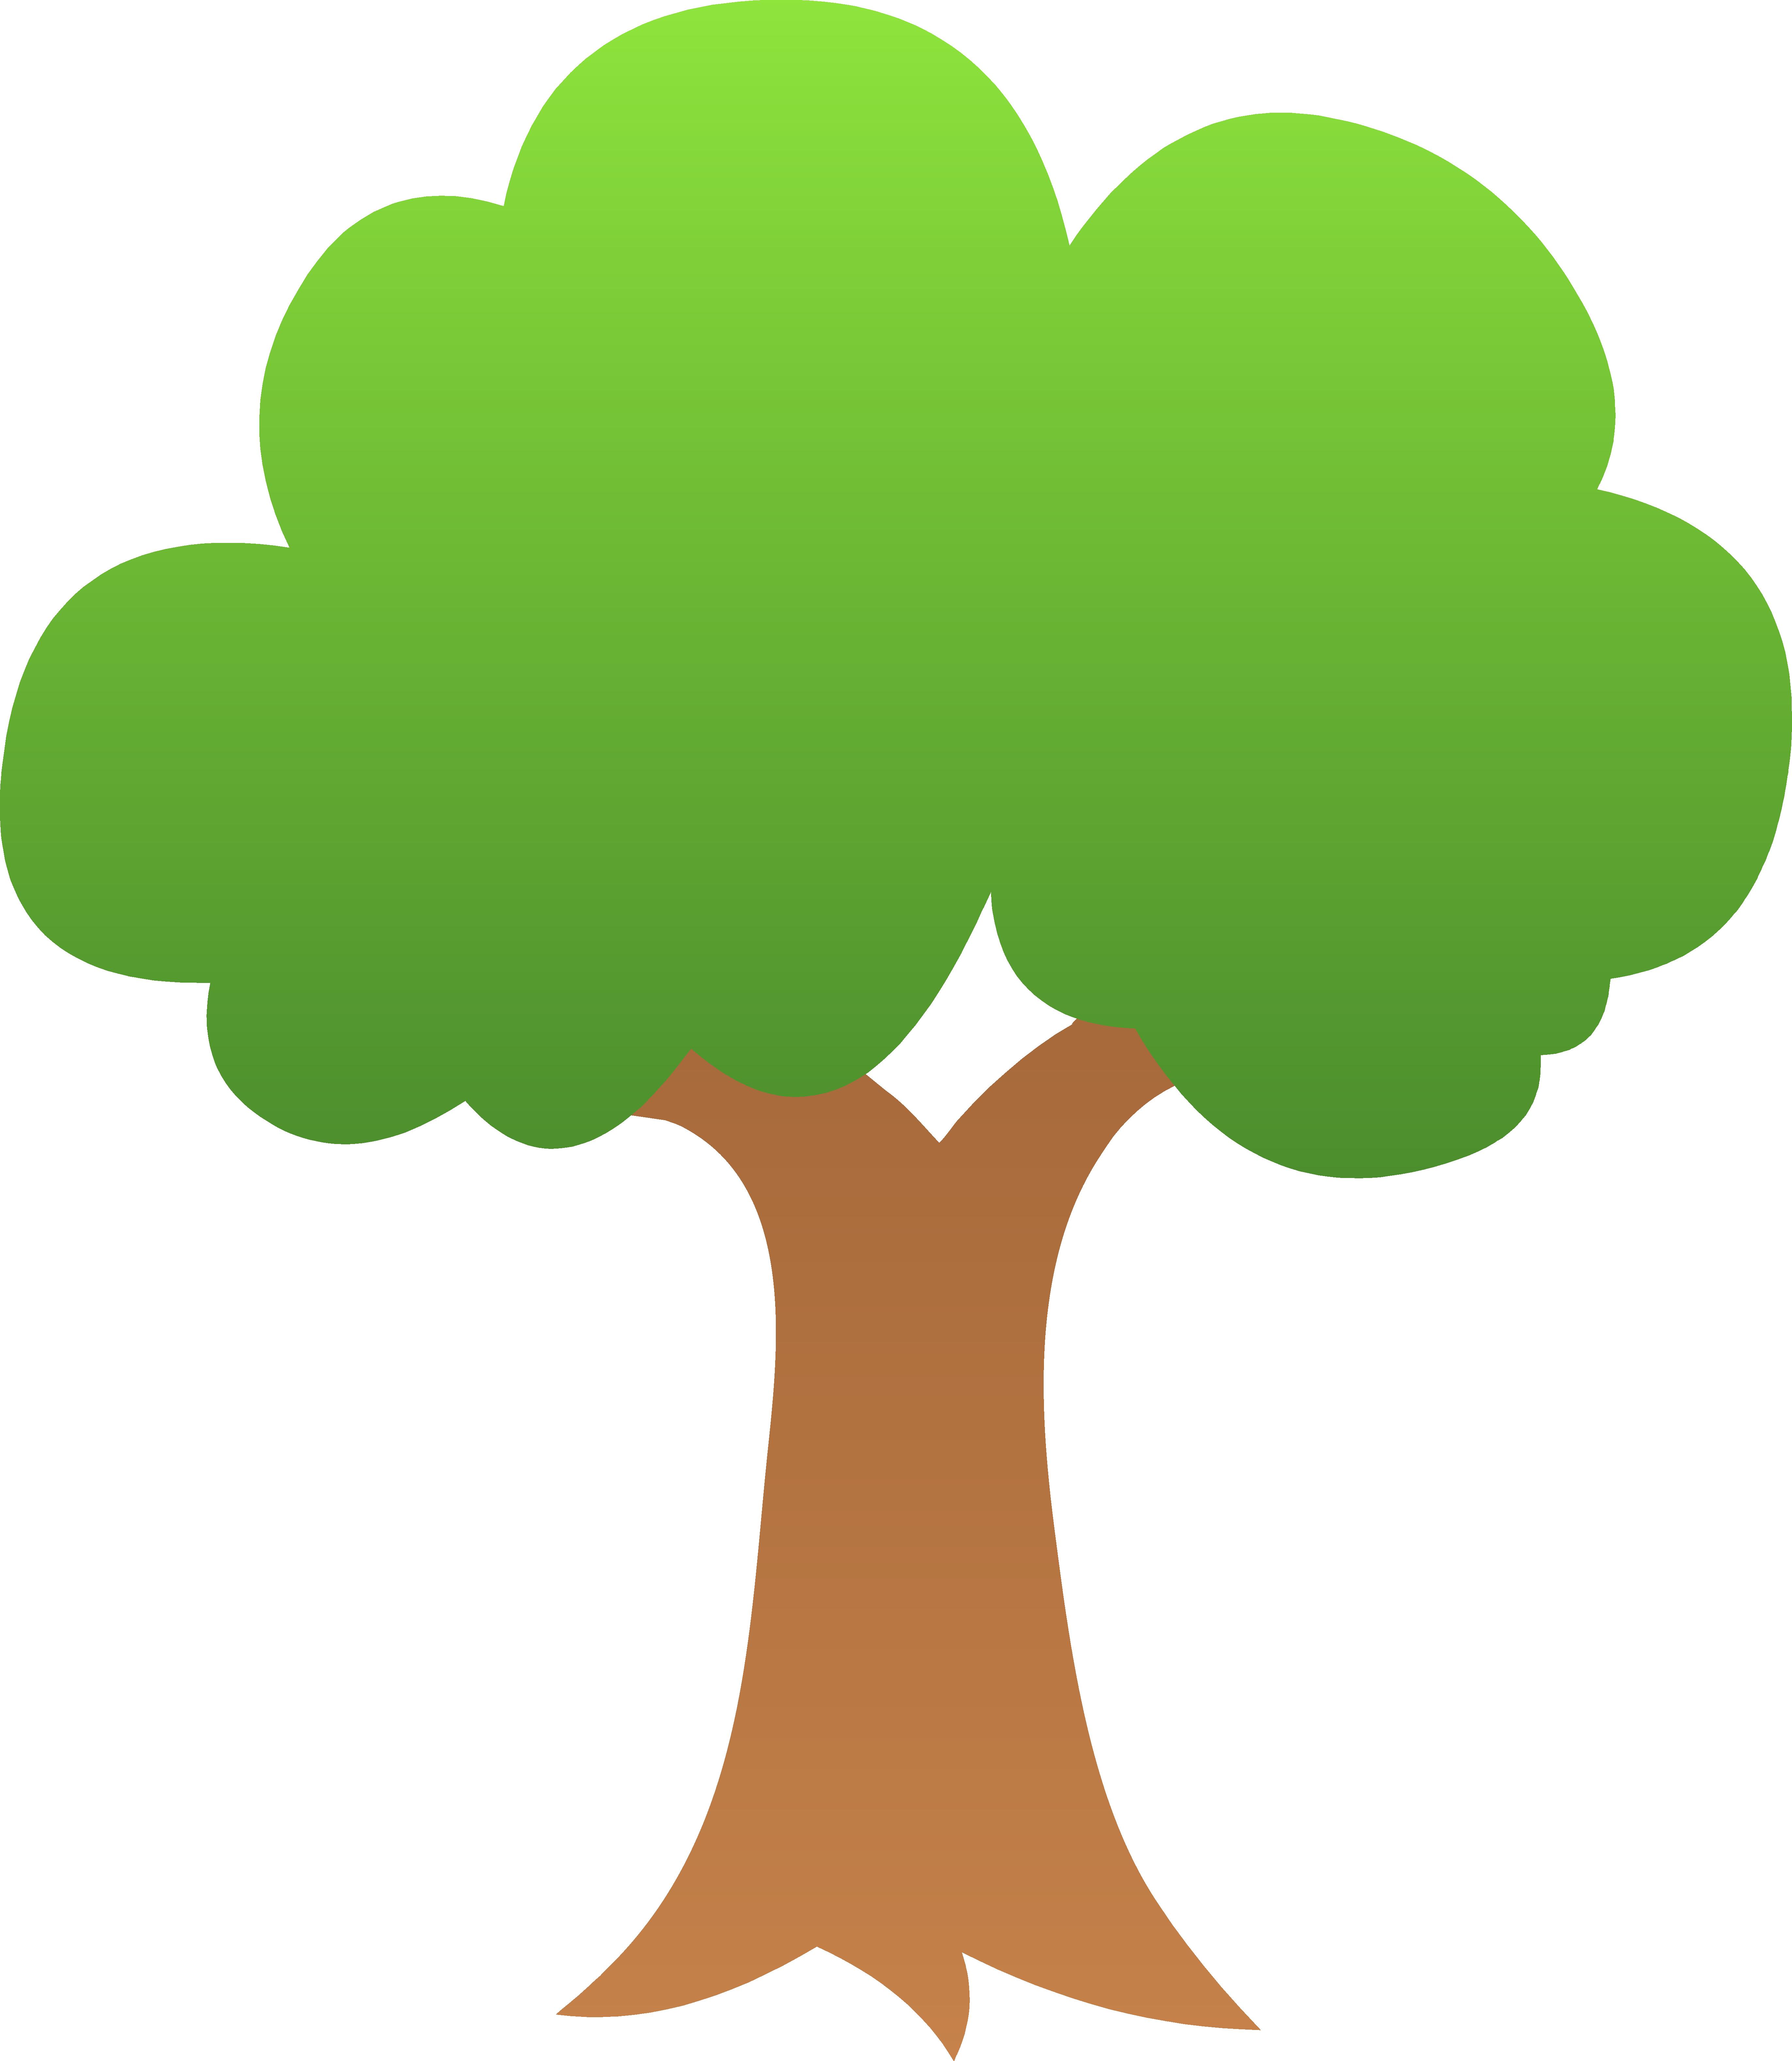 Tree Clip Art 1 - Tree Clipart PNG